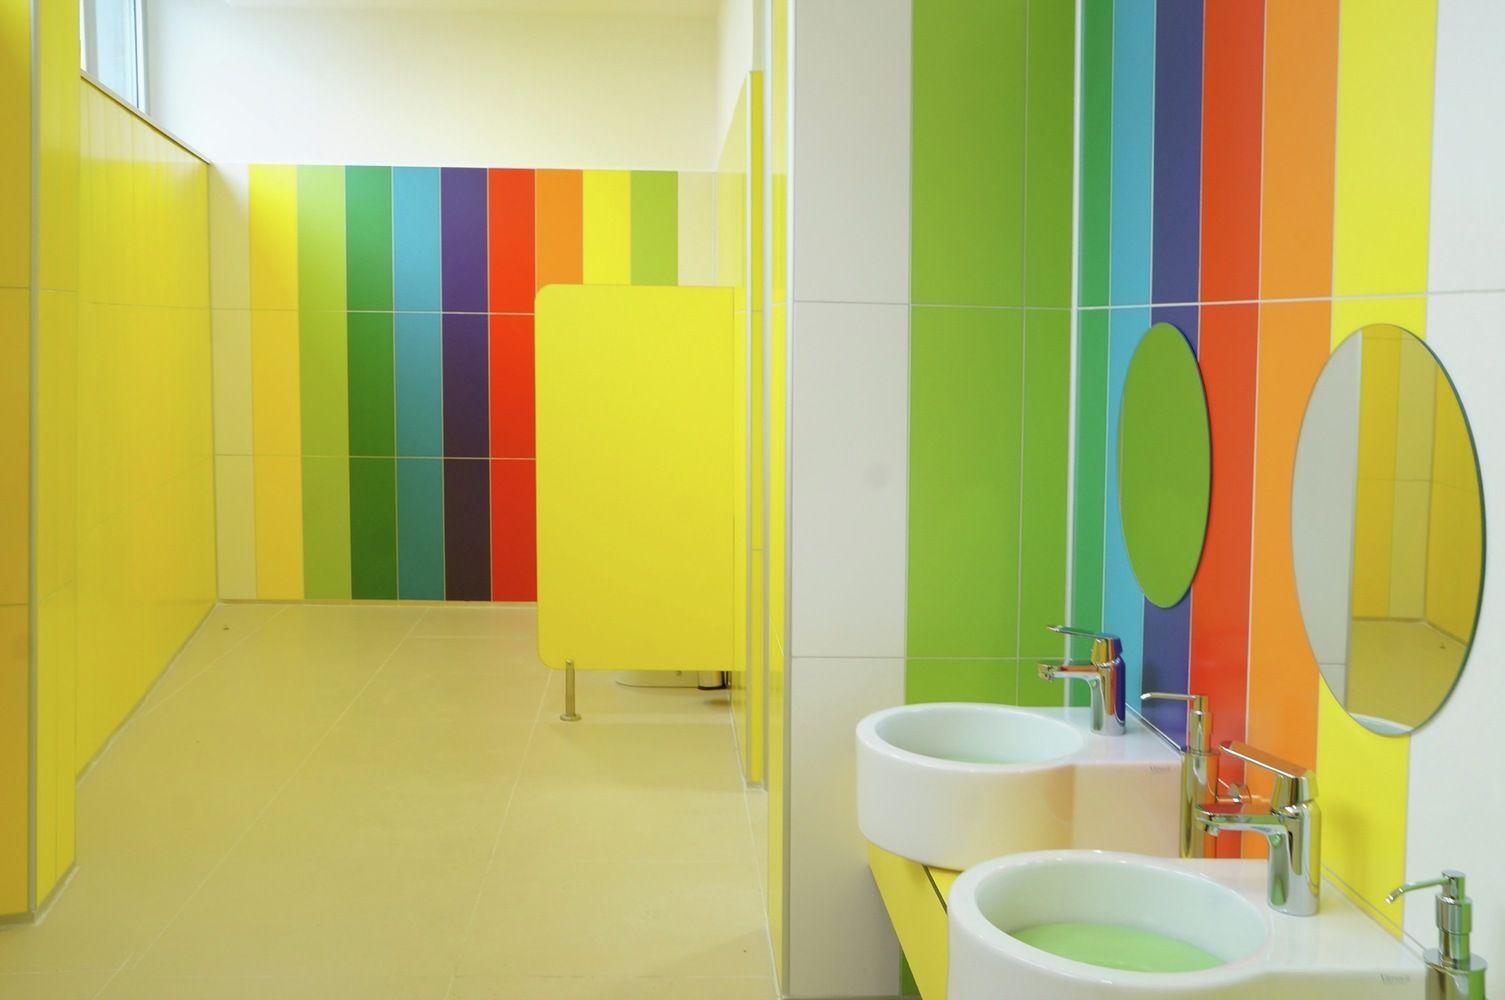 Gallery of fca srbija kindergarten idest doo 2 in 2019 for Diseno curricular jardin maternal